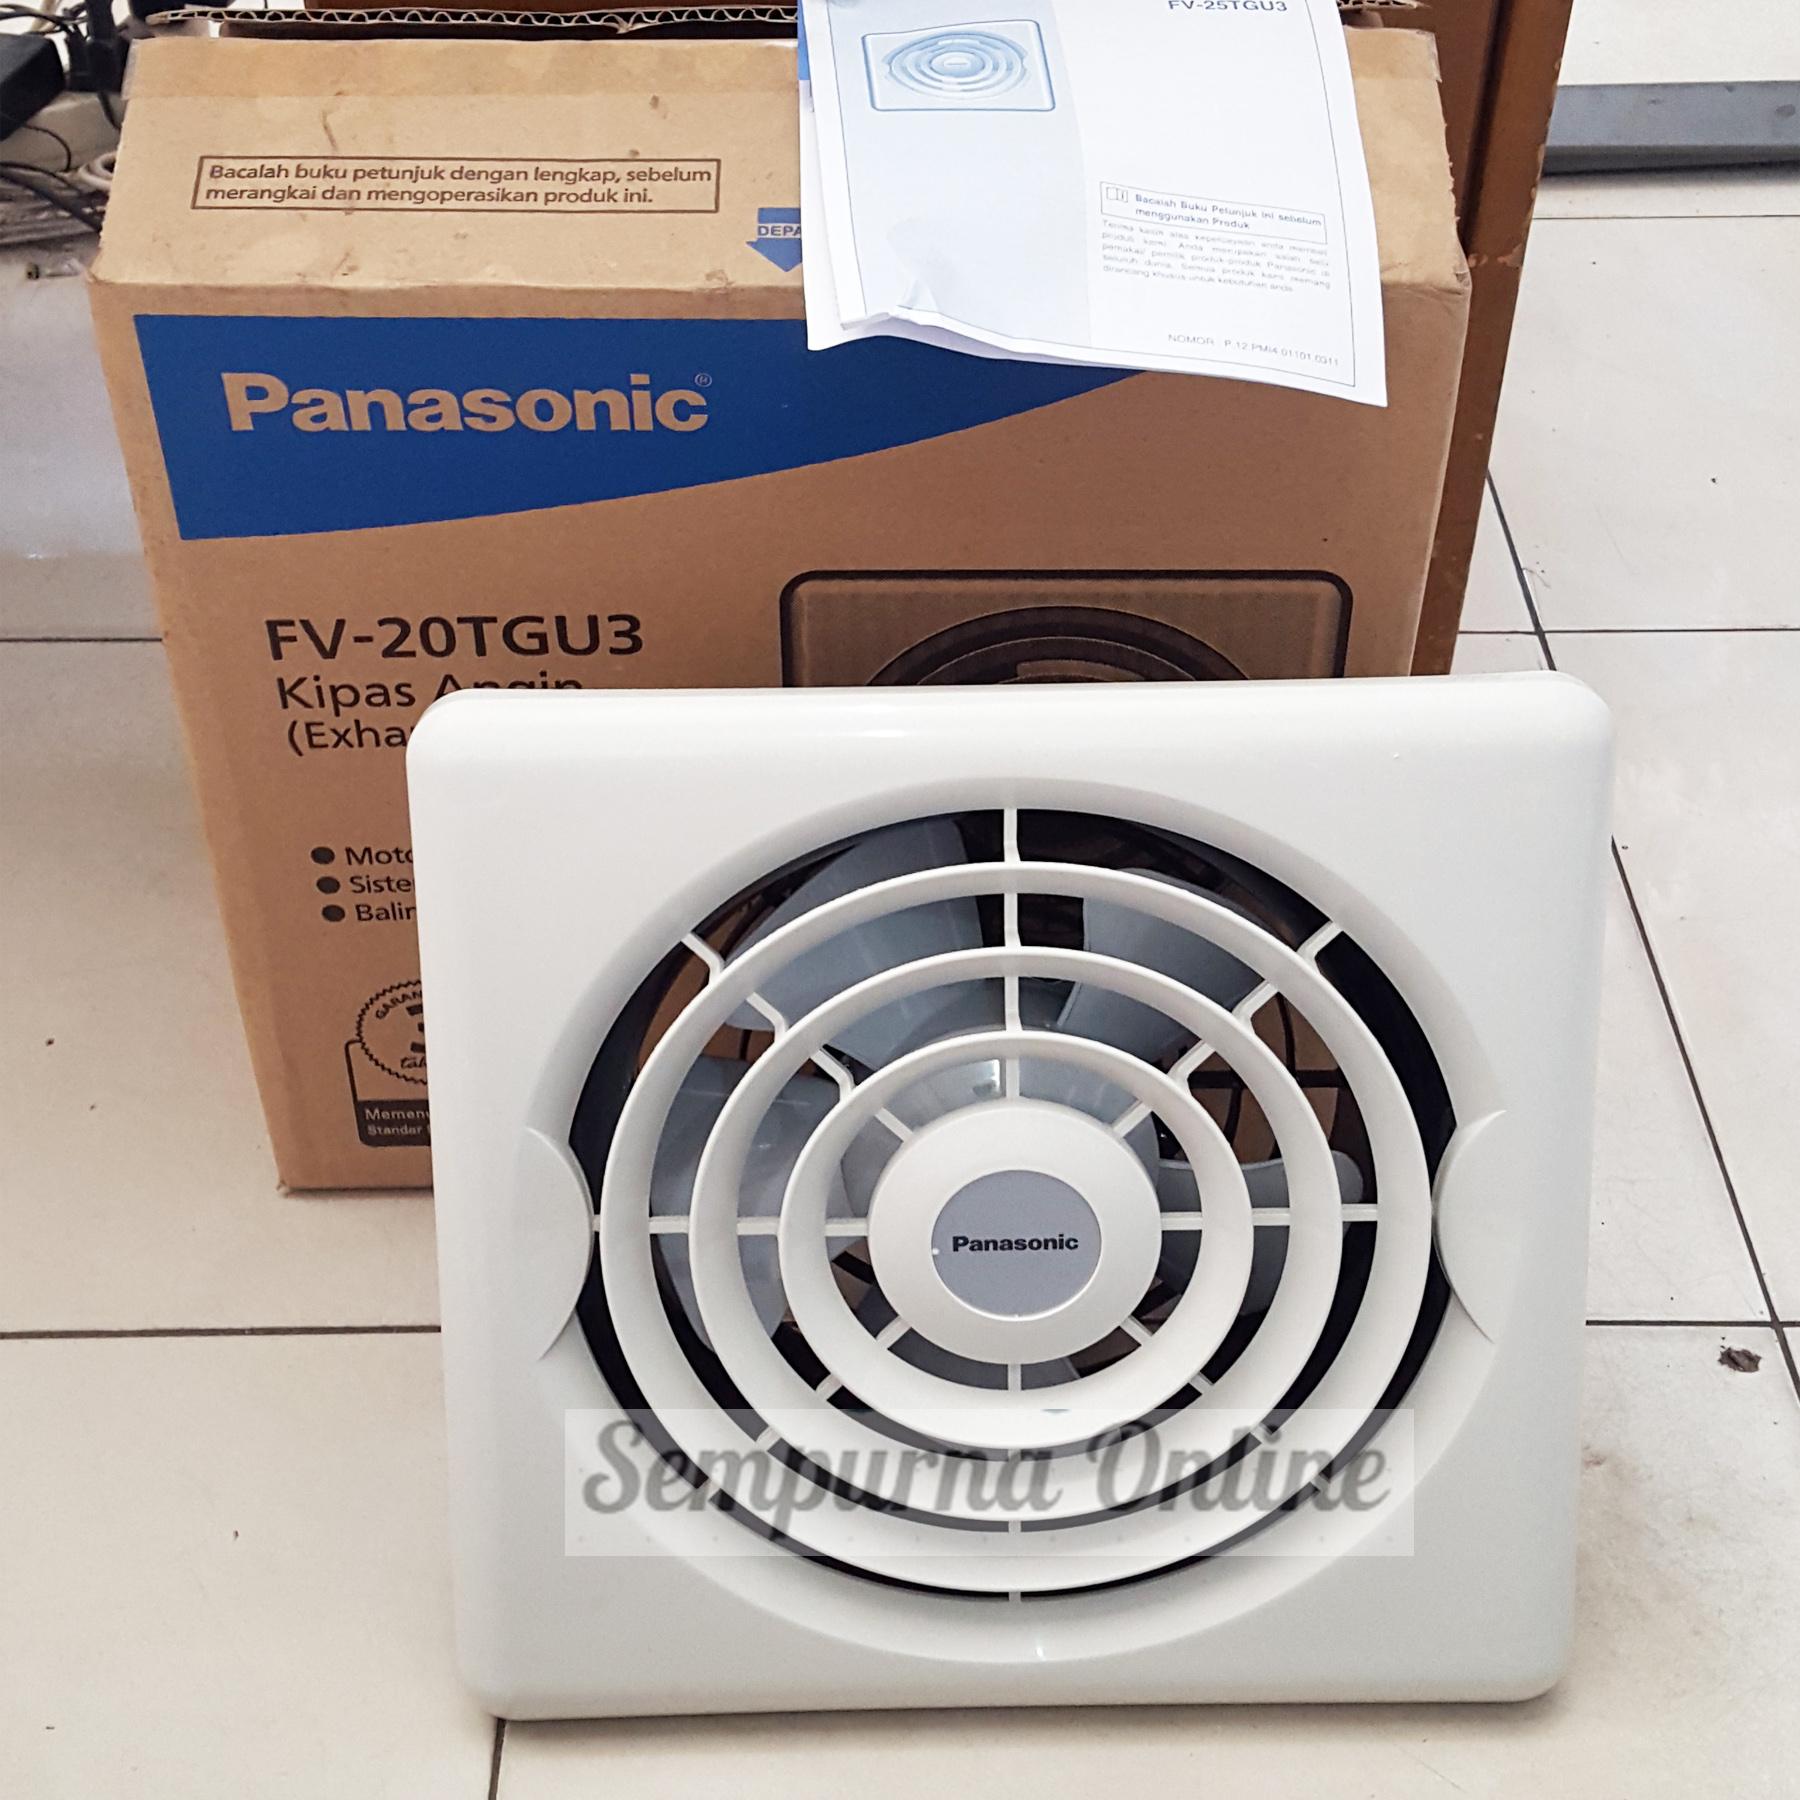 Panasonic Ceiling Exhaust Fan 8 Inch Fv 20tgu Bottlesandblends